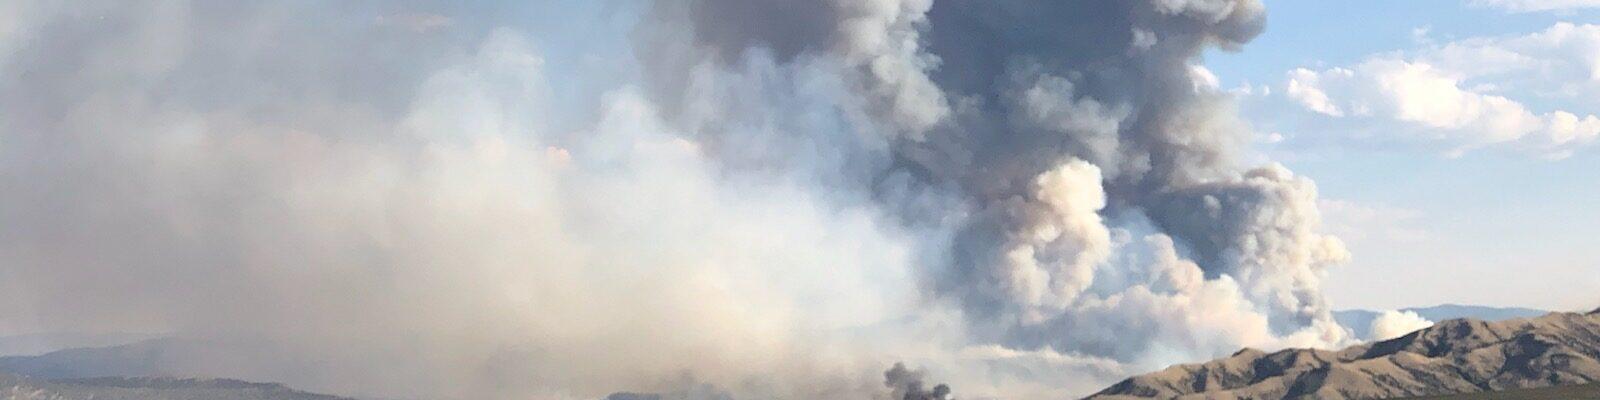 smoke column on Richard Mountain Fire